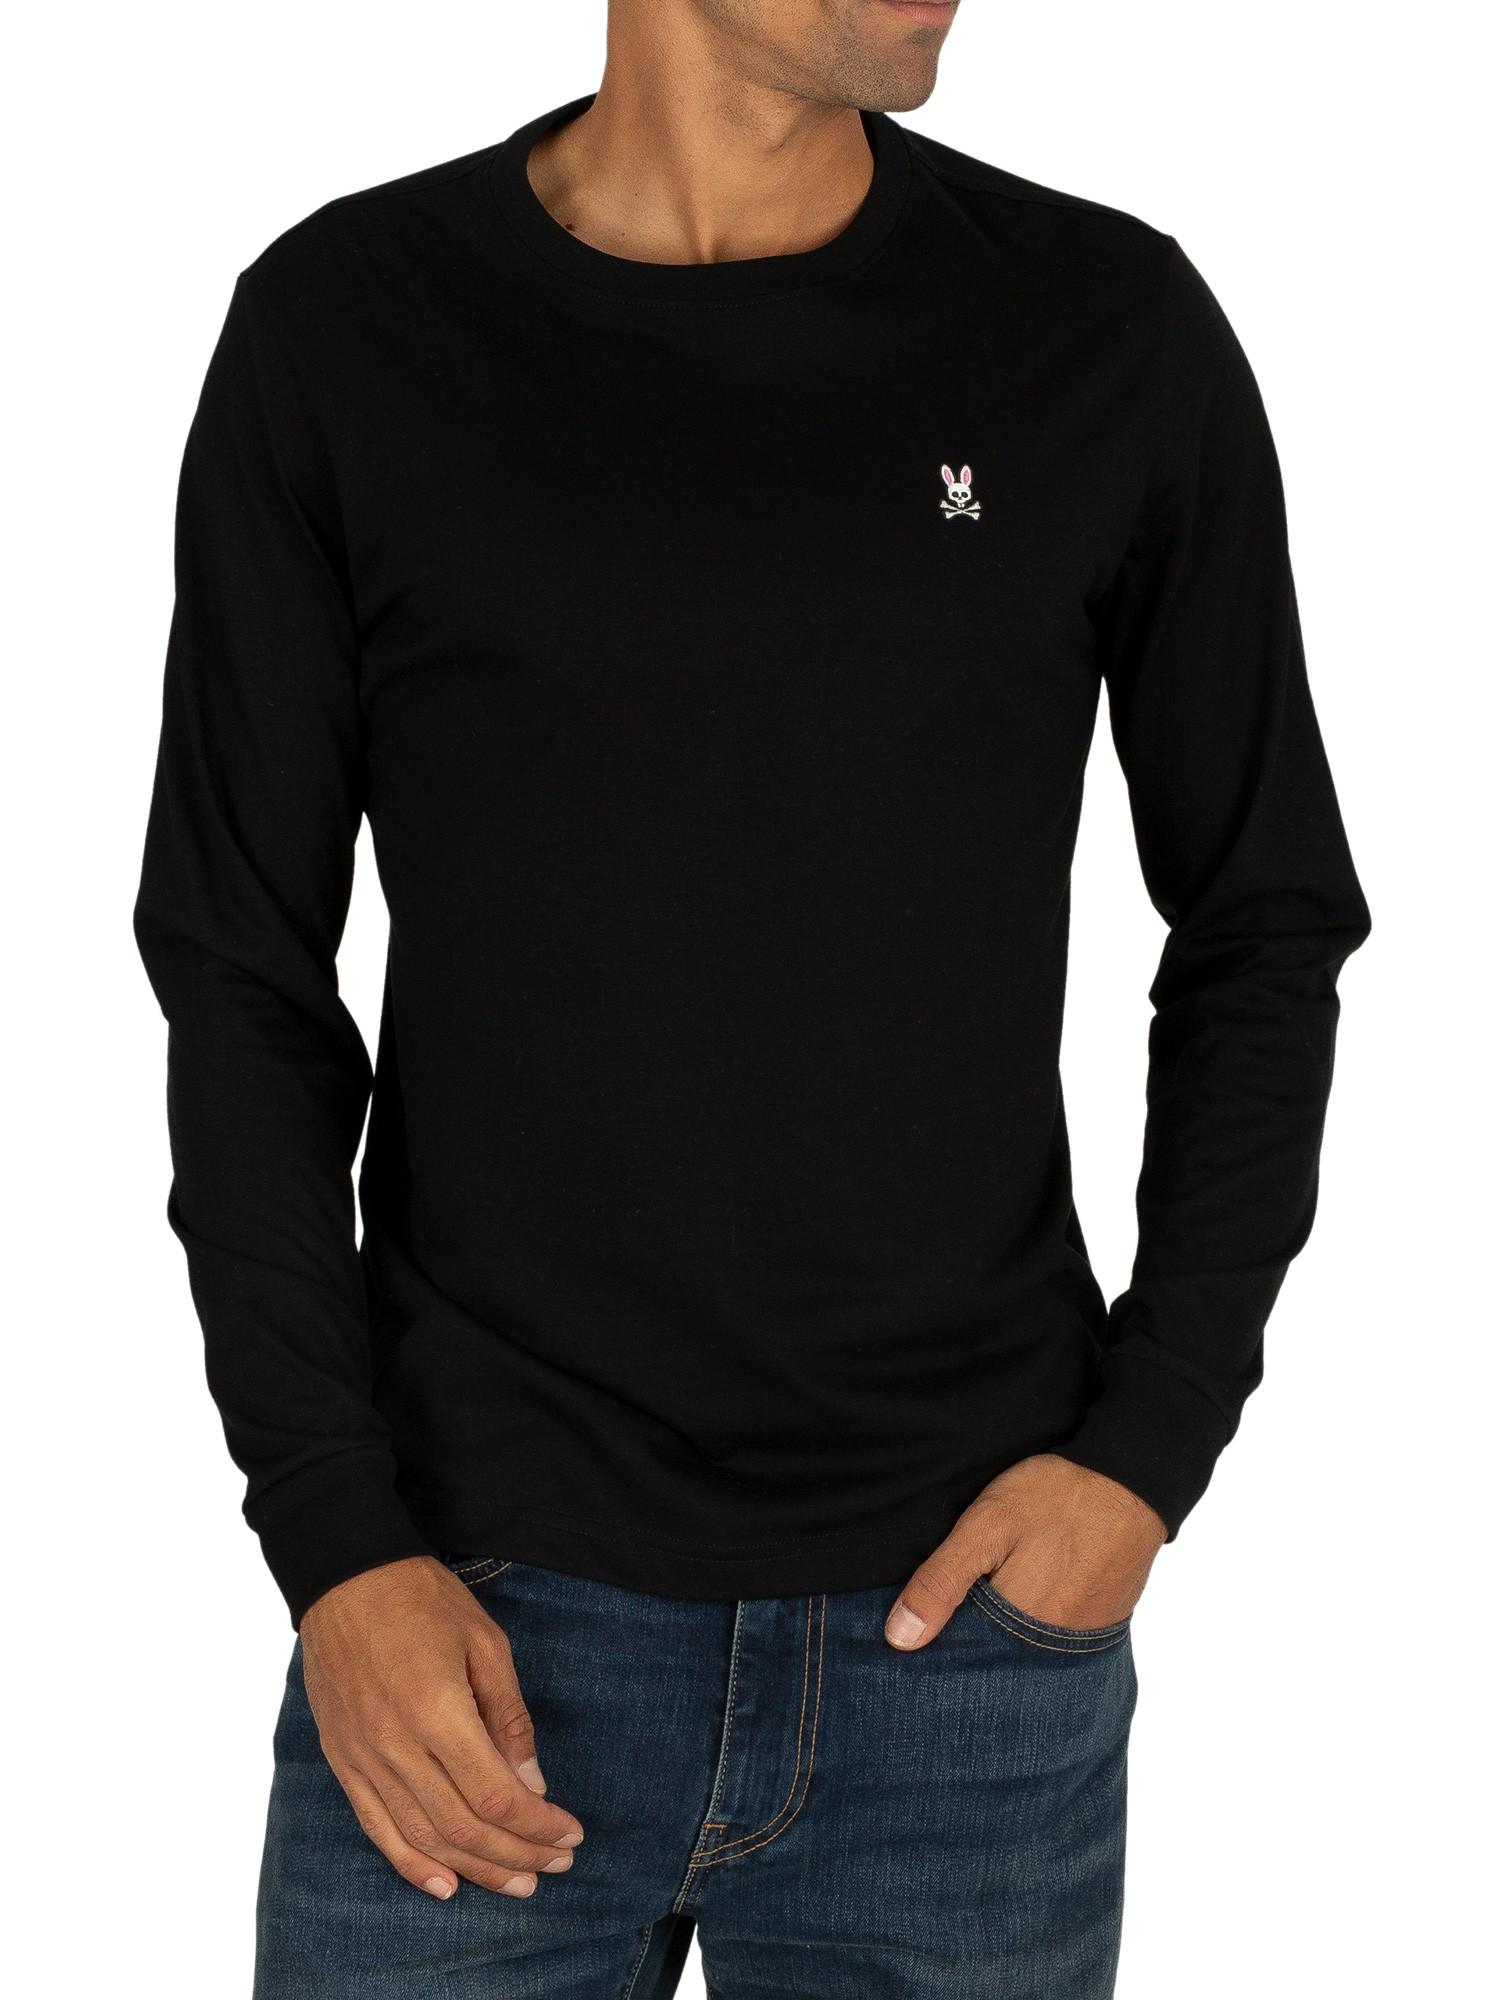 Mens Psycho Bunny Long Sleeve Crew Neck T-Shirt Grey SALE WAS £60